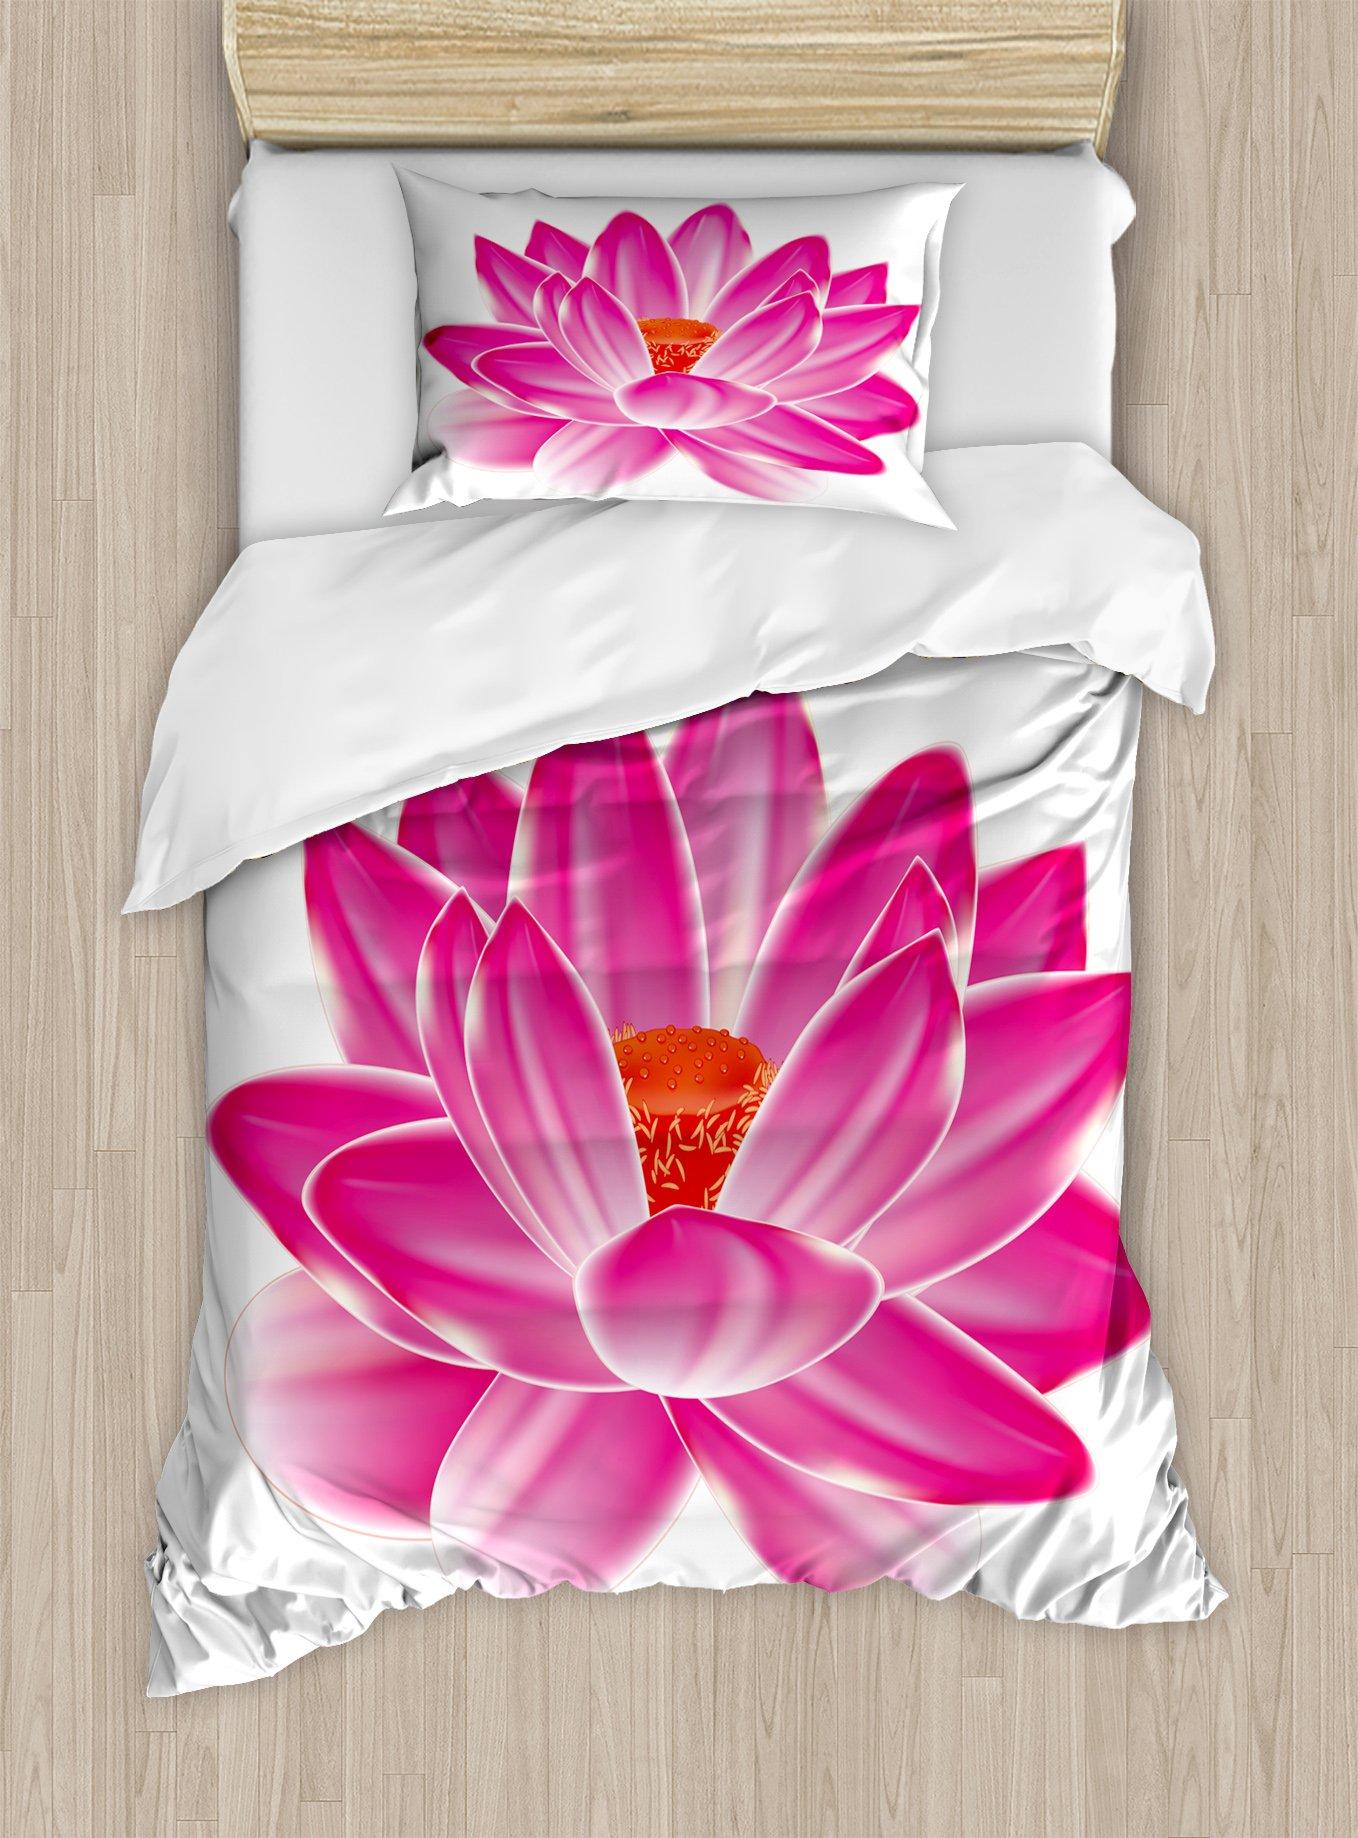 Ambesonne Lotus Duvet Cover Set Twin Size, Vibrant Lotus Flower Pattern Spa Zen Yoga Asian Balance Energy Lifestyle Artsy Image, Decorative 2 Piece Bedding Set with 1 Pillow Sham, Magenta Red